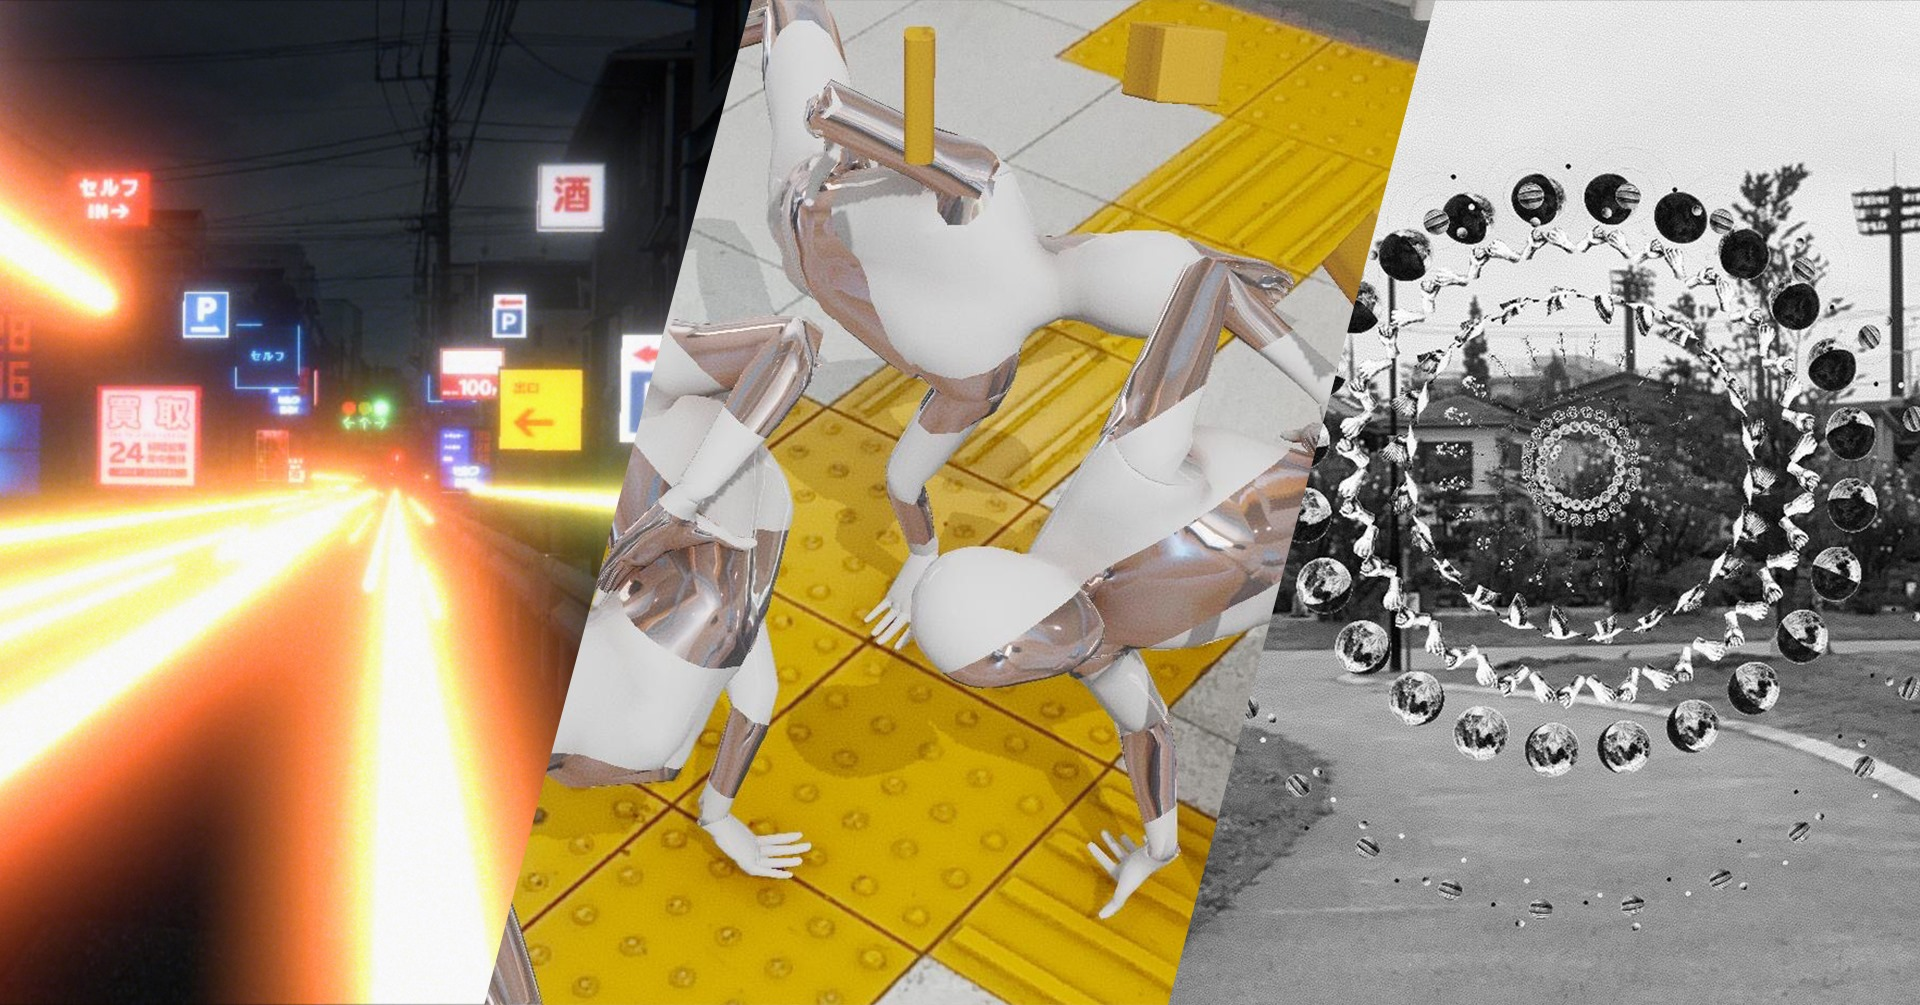 WOWが「WOW AR」アプリを公開 あらゆる空間をアート化する「WOW AR Art Platform」の第1弾プロジェクト